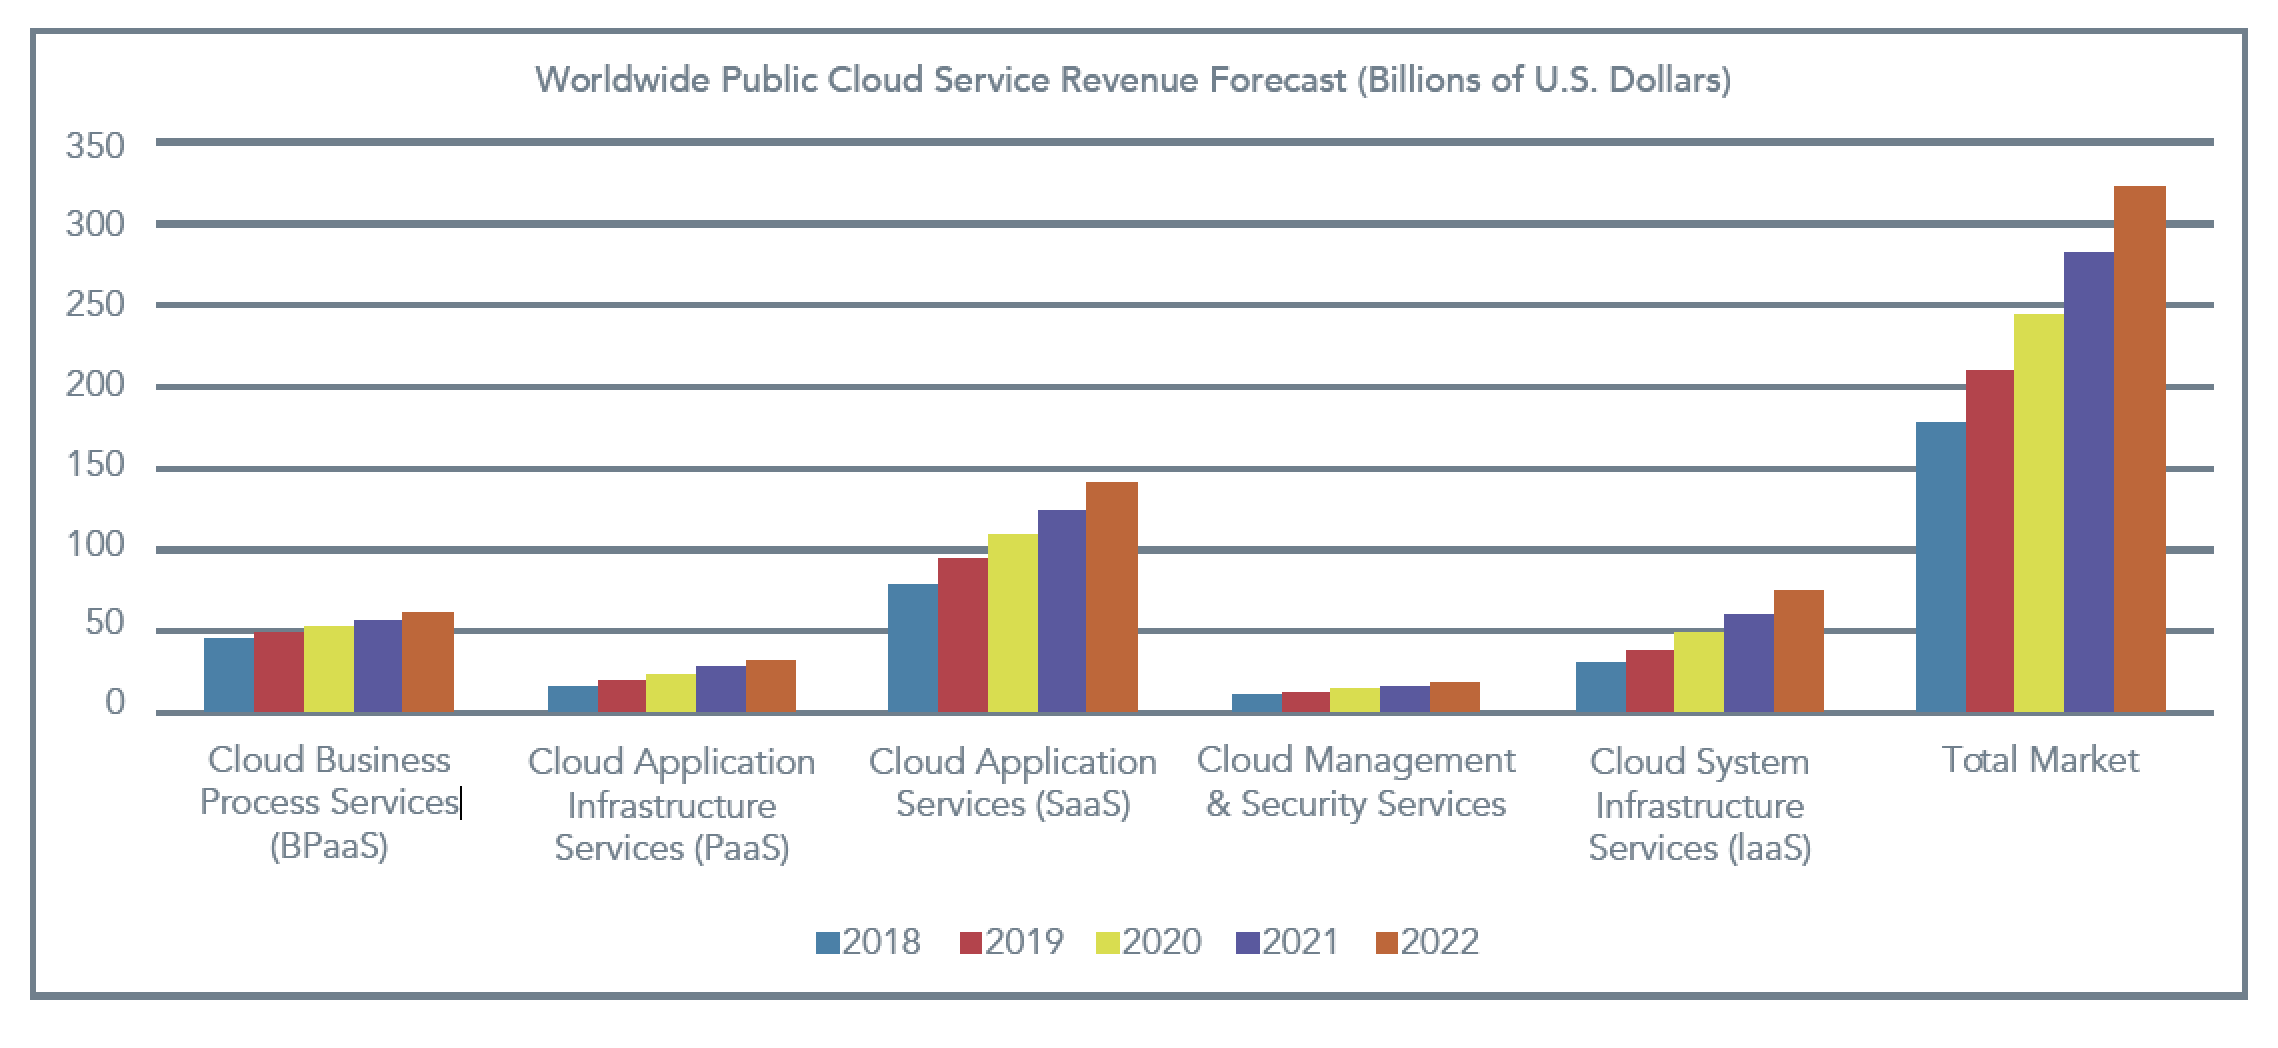 Worldwide Public Cloud Service Revenue Forecast (Billions of U.S. Dollars)